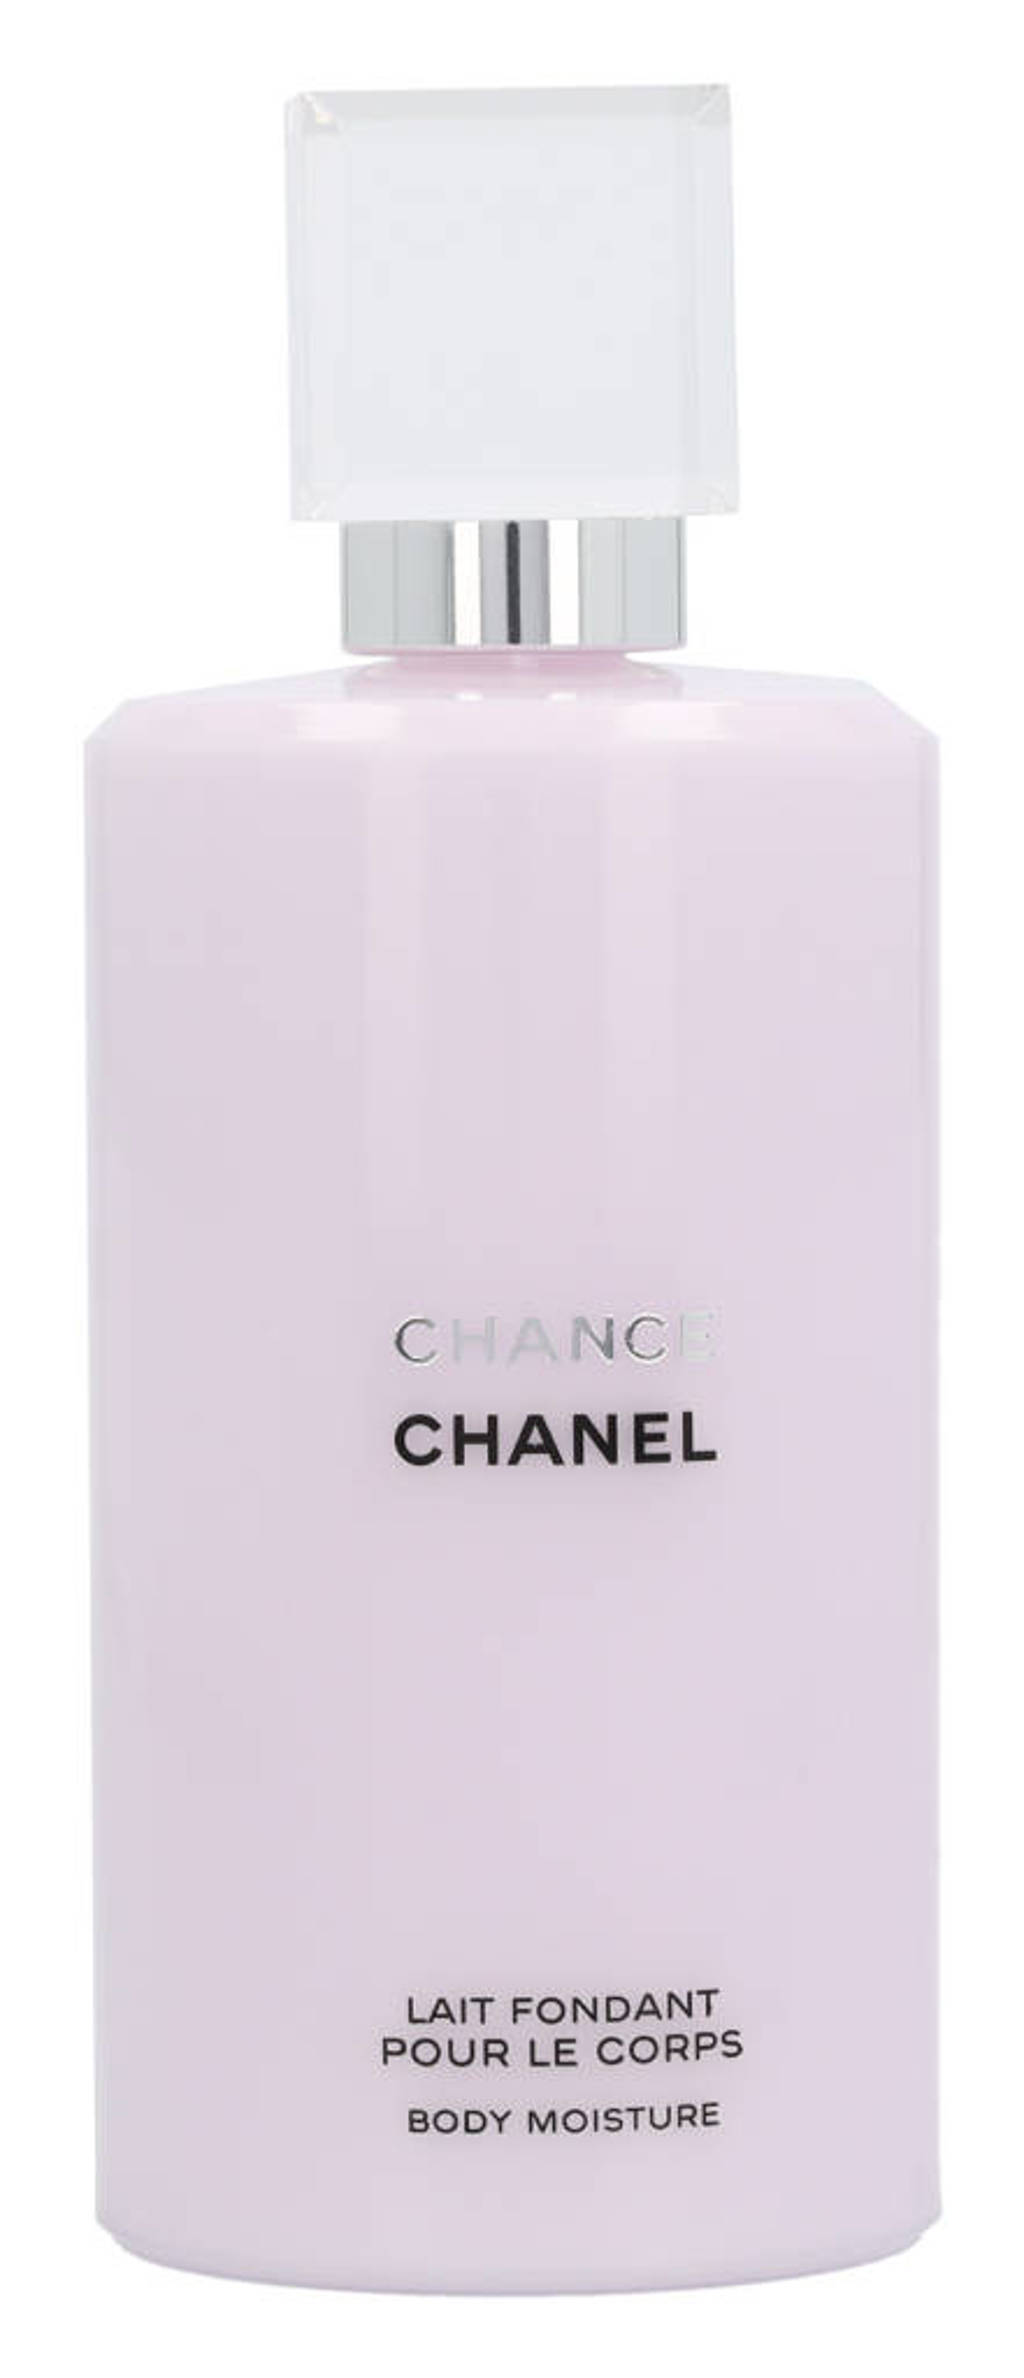 Chanel Chance bodylotion